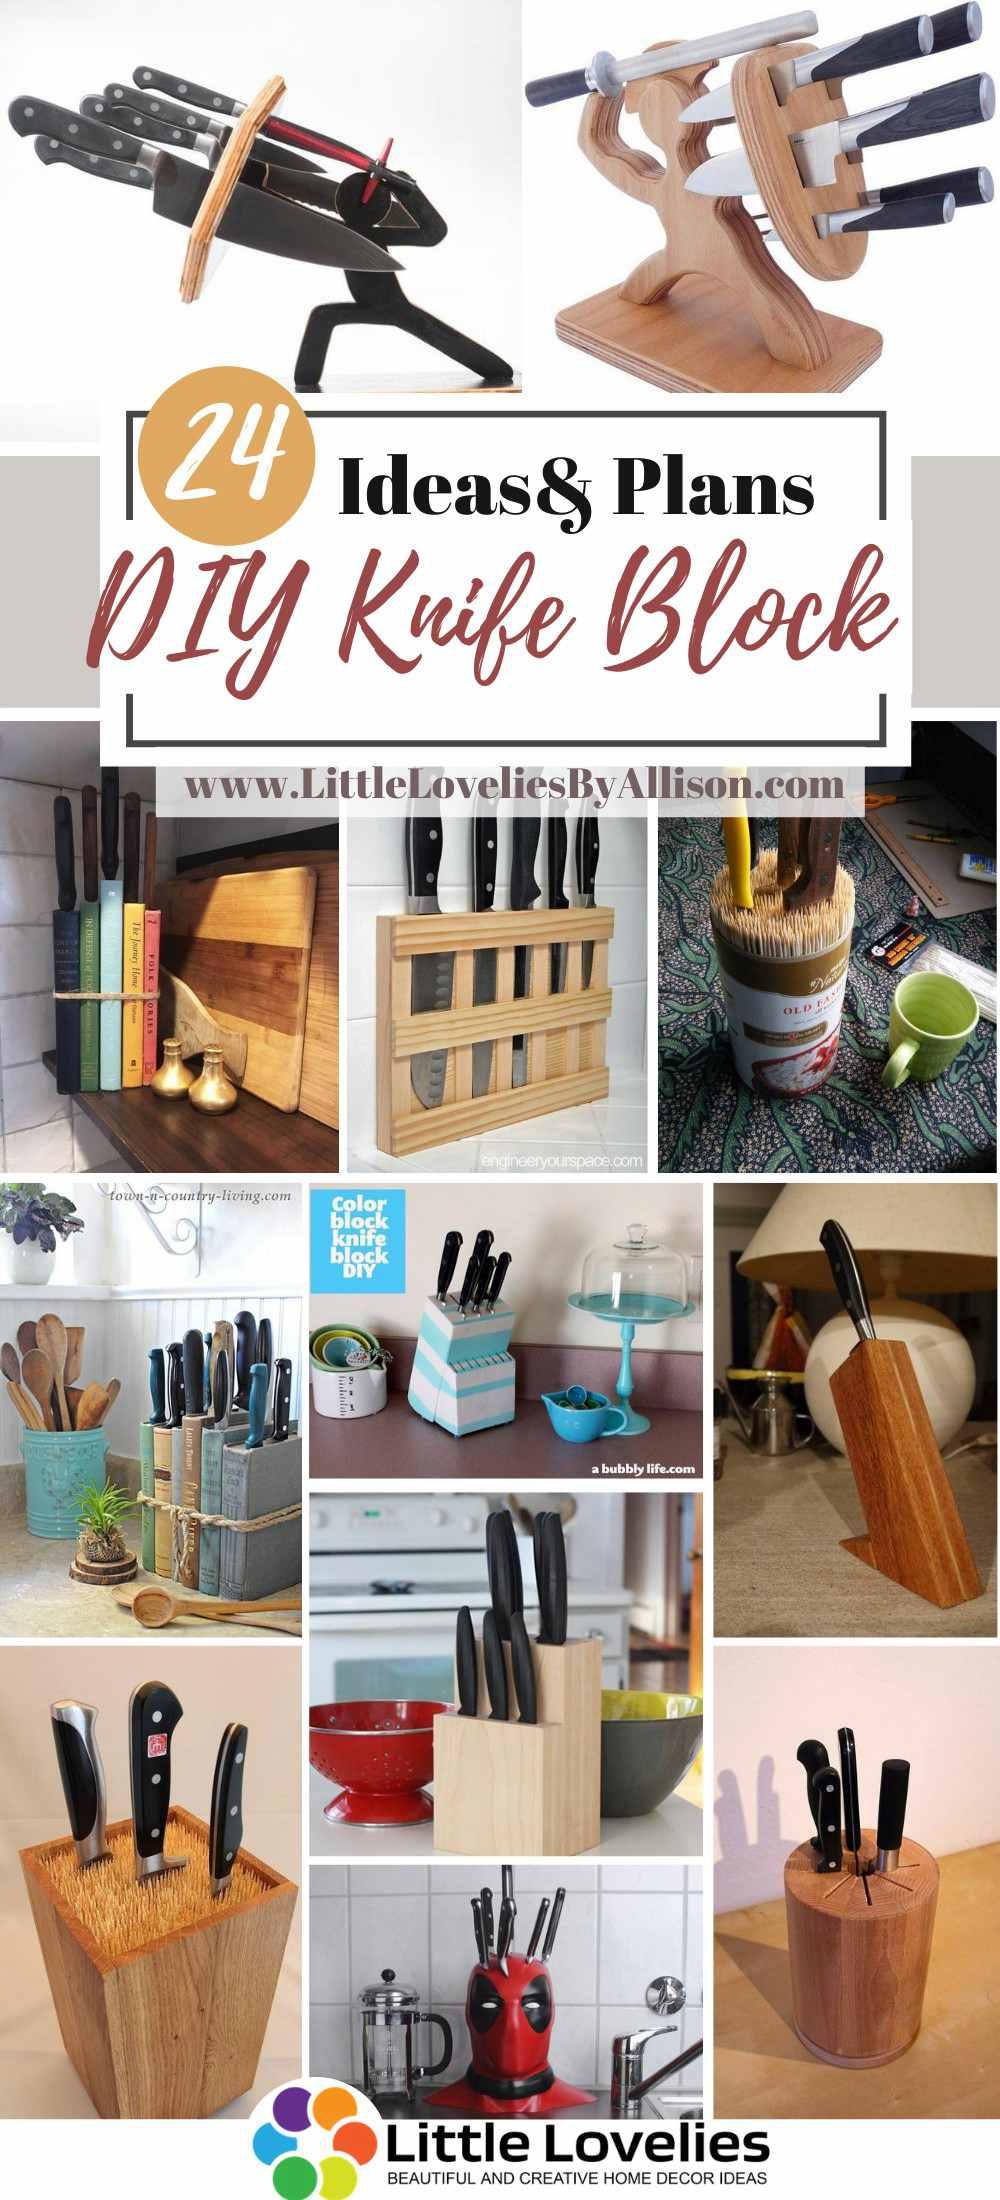 diy-knife-block-ideas